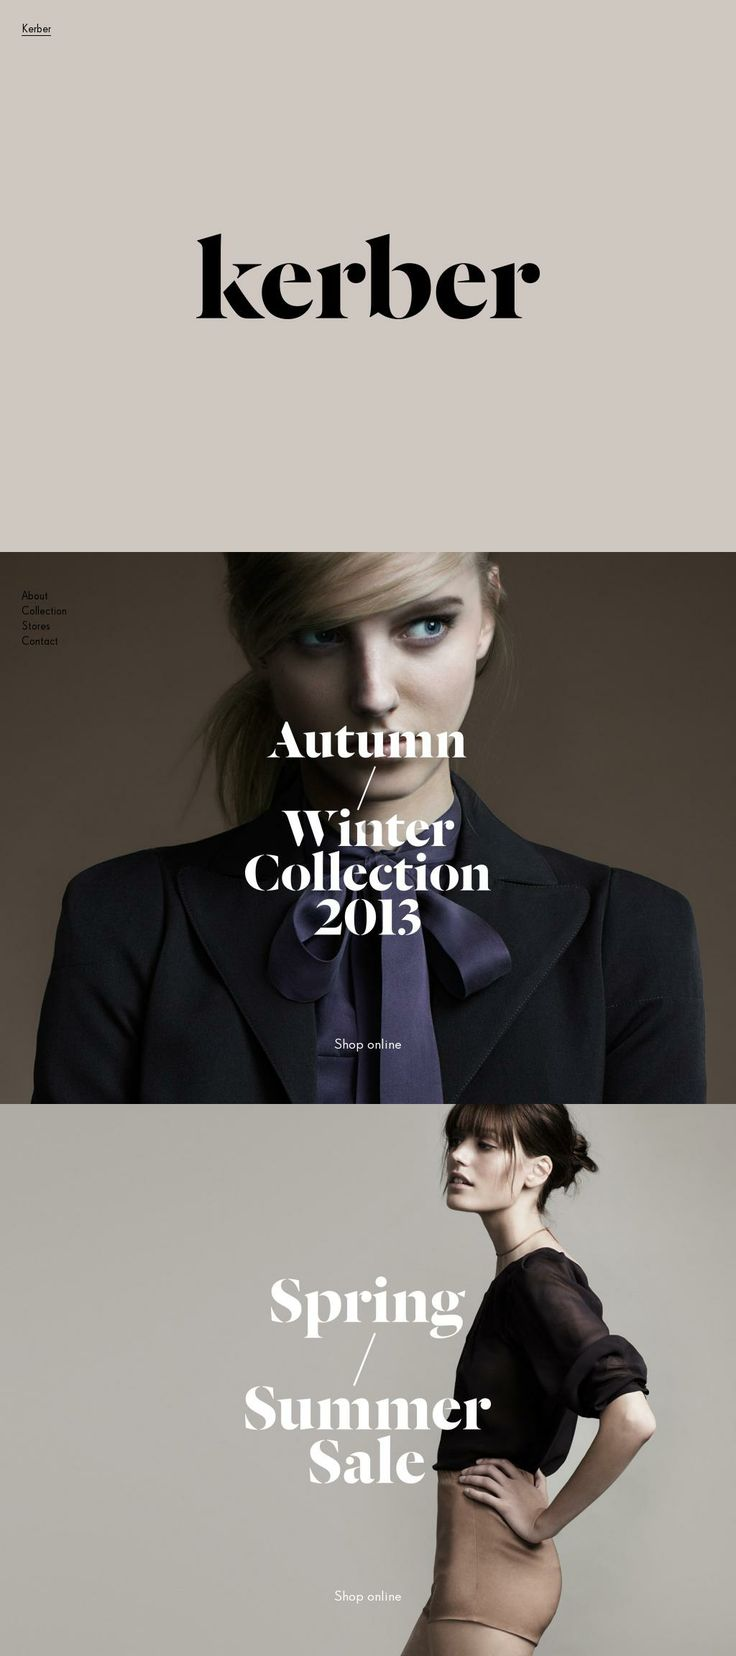 Kerber Website   Design: UI/UX. Apps. Websites   Marielle Kerber  